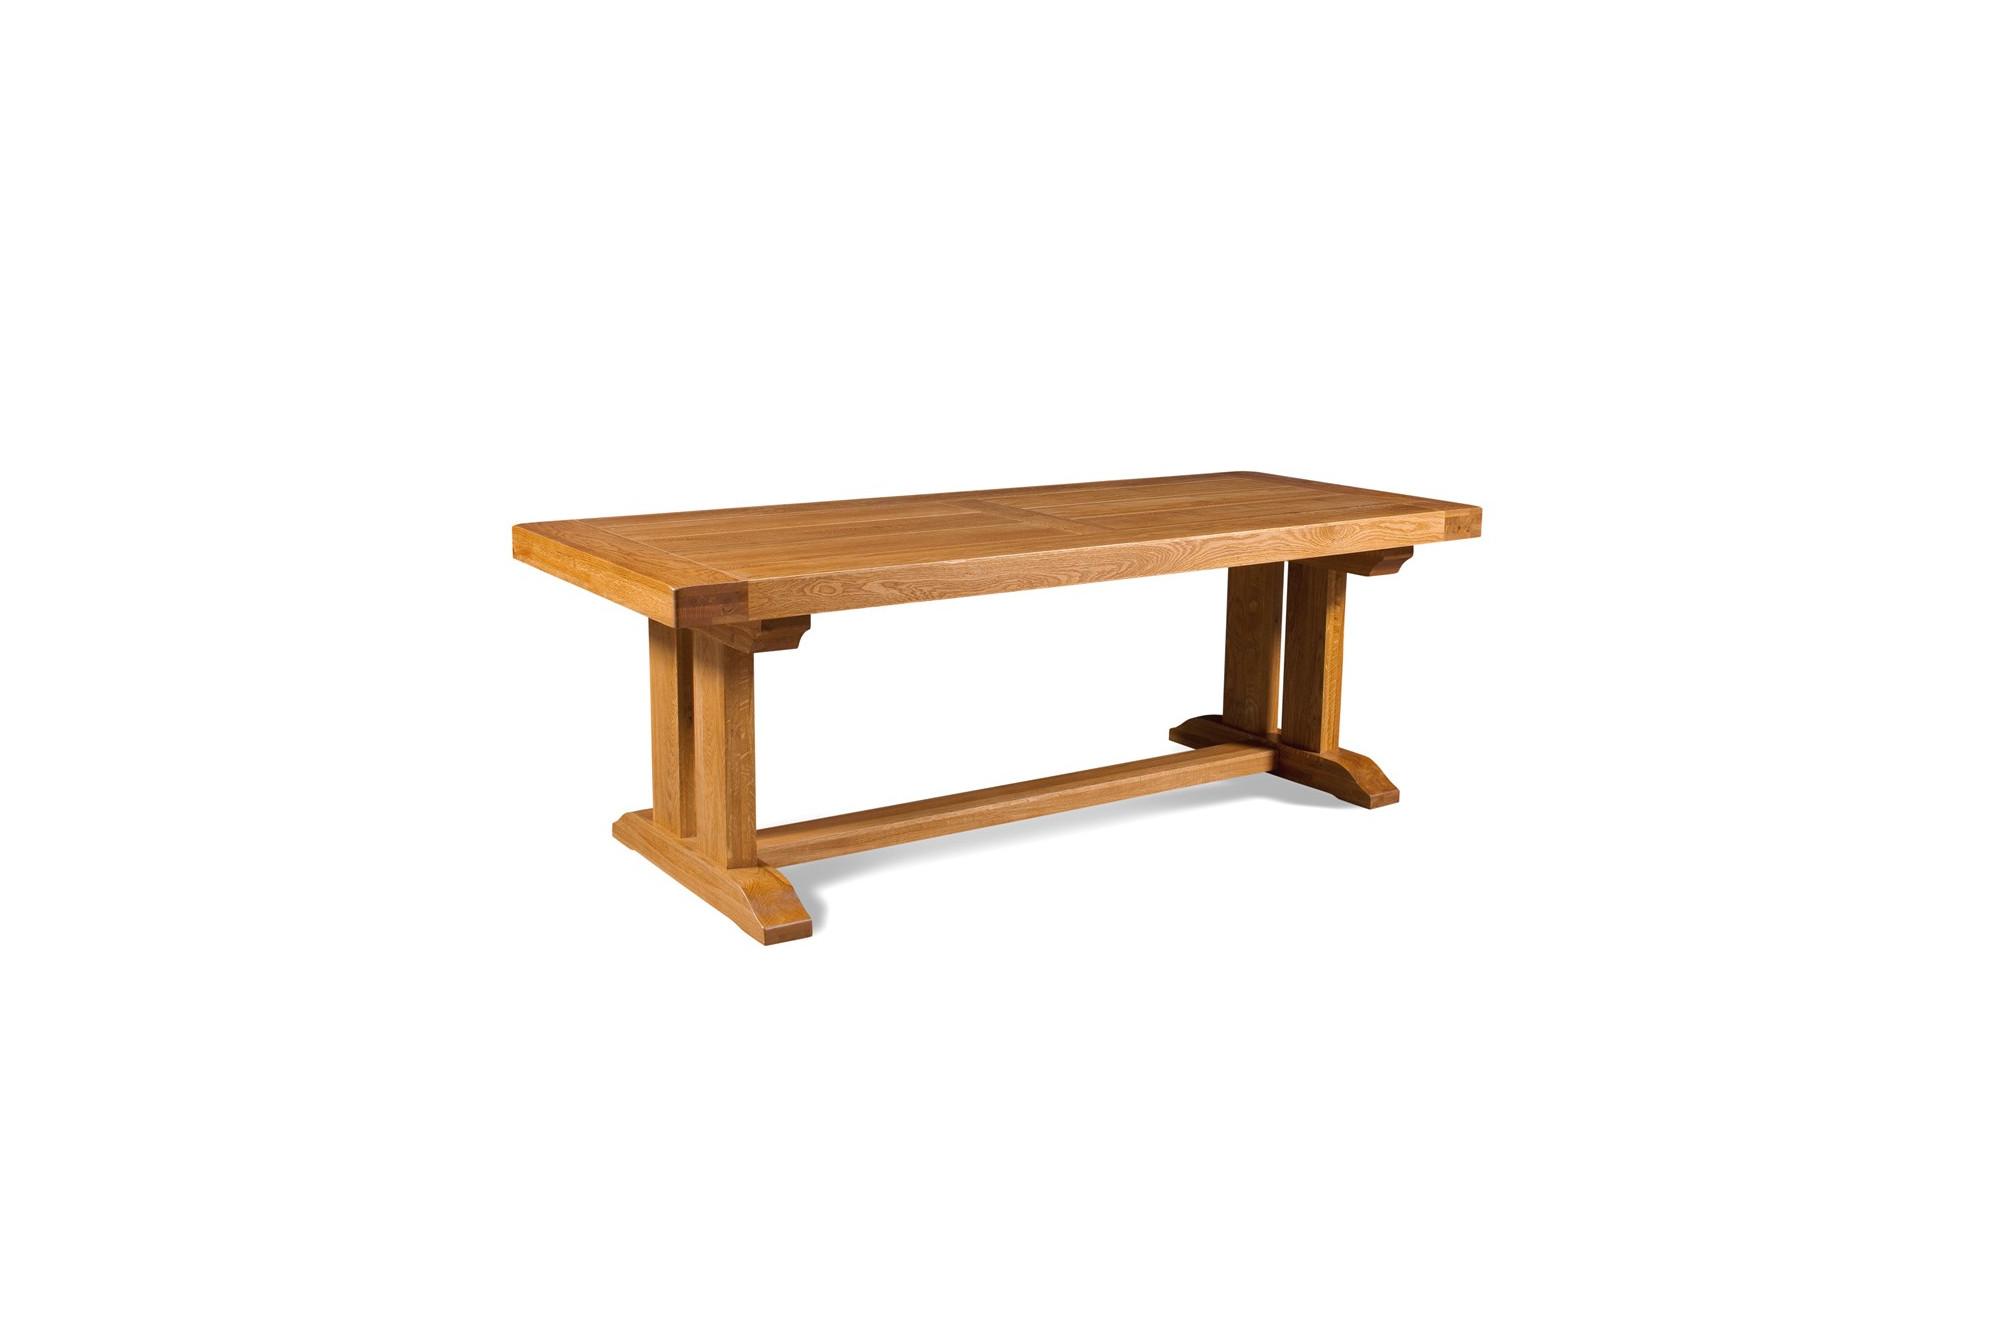 Massif D'occasion Hellin Chêne Table Modèle En mN0Oy8vnw